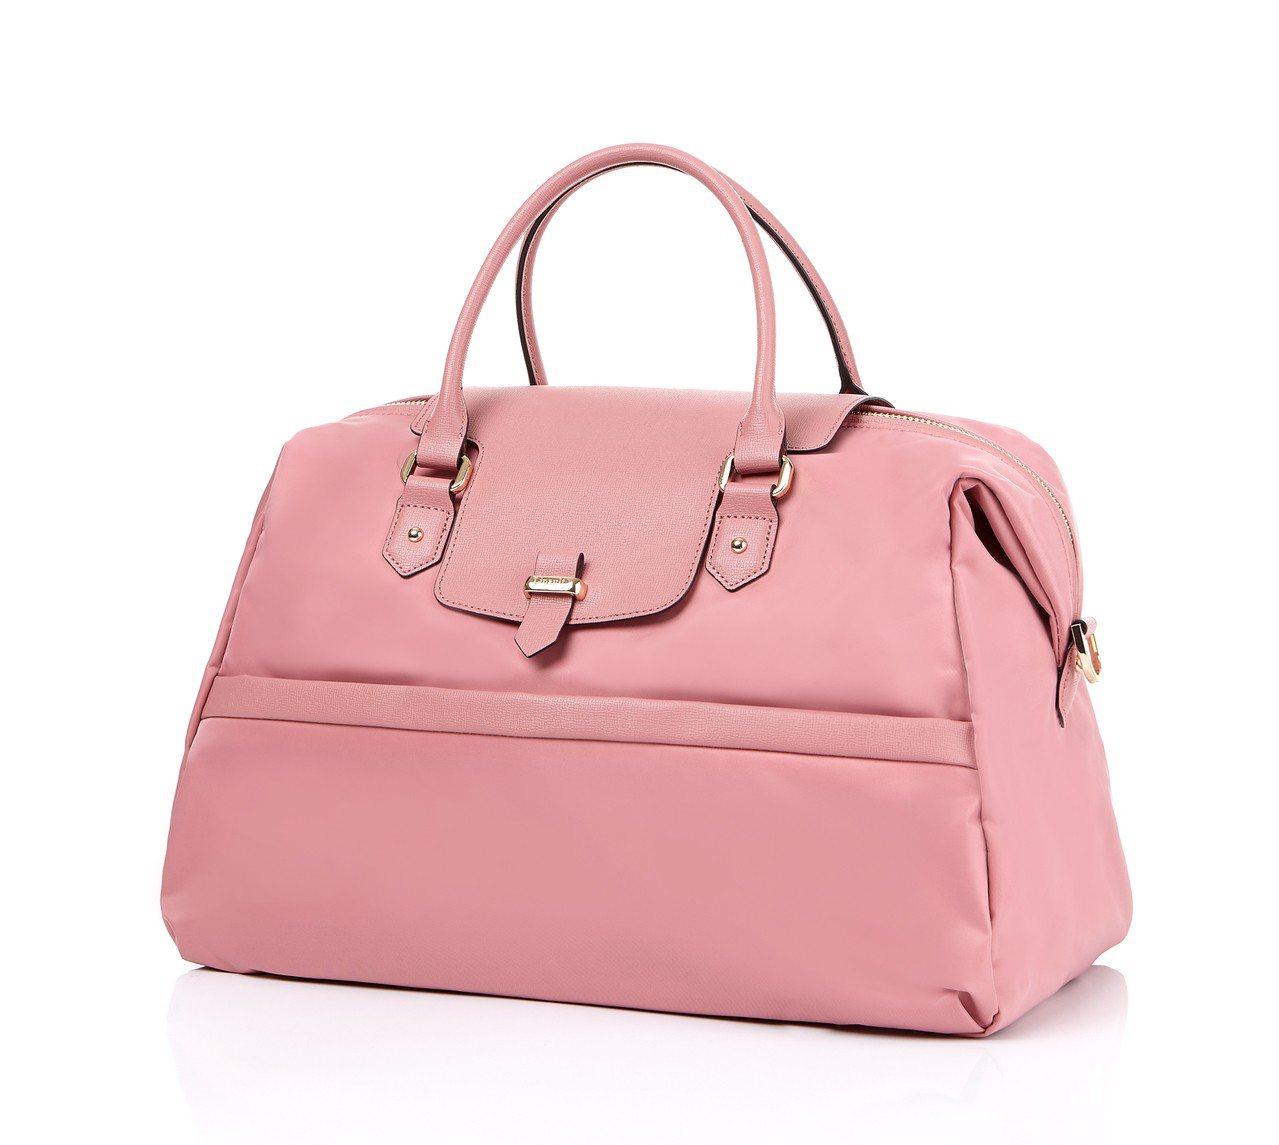 PLUME AVENUE行李袋,嬰兒粉,4,200元。圖/Lipault提供